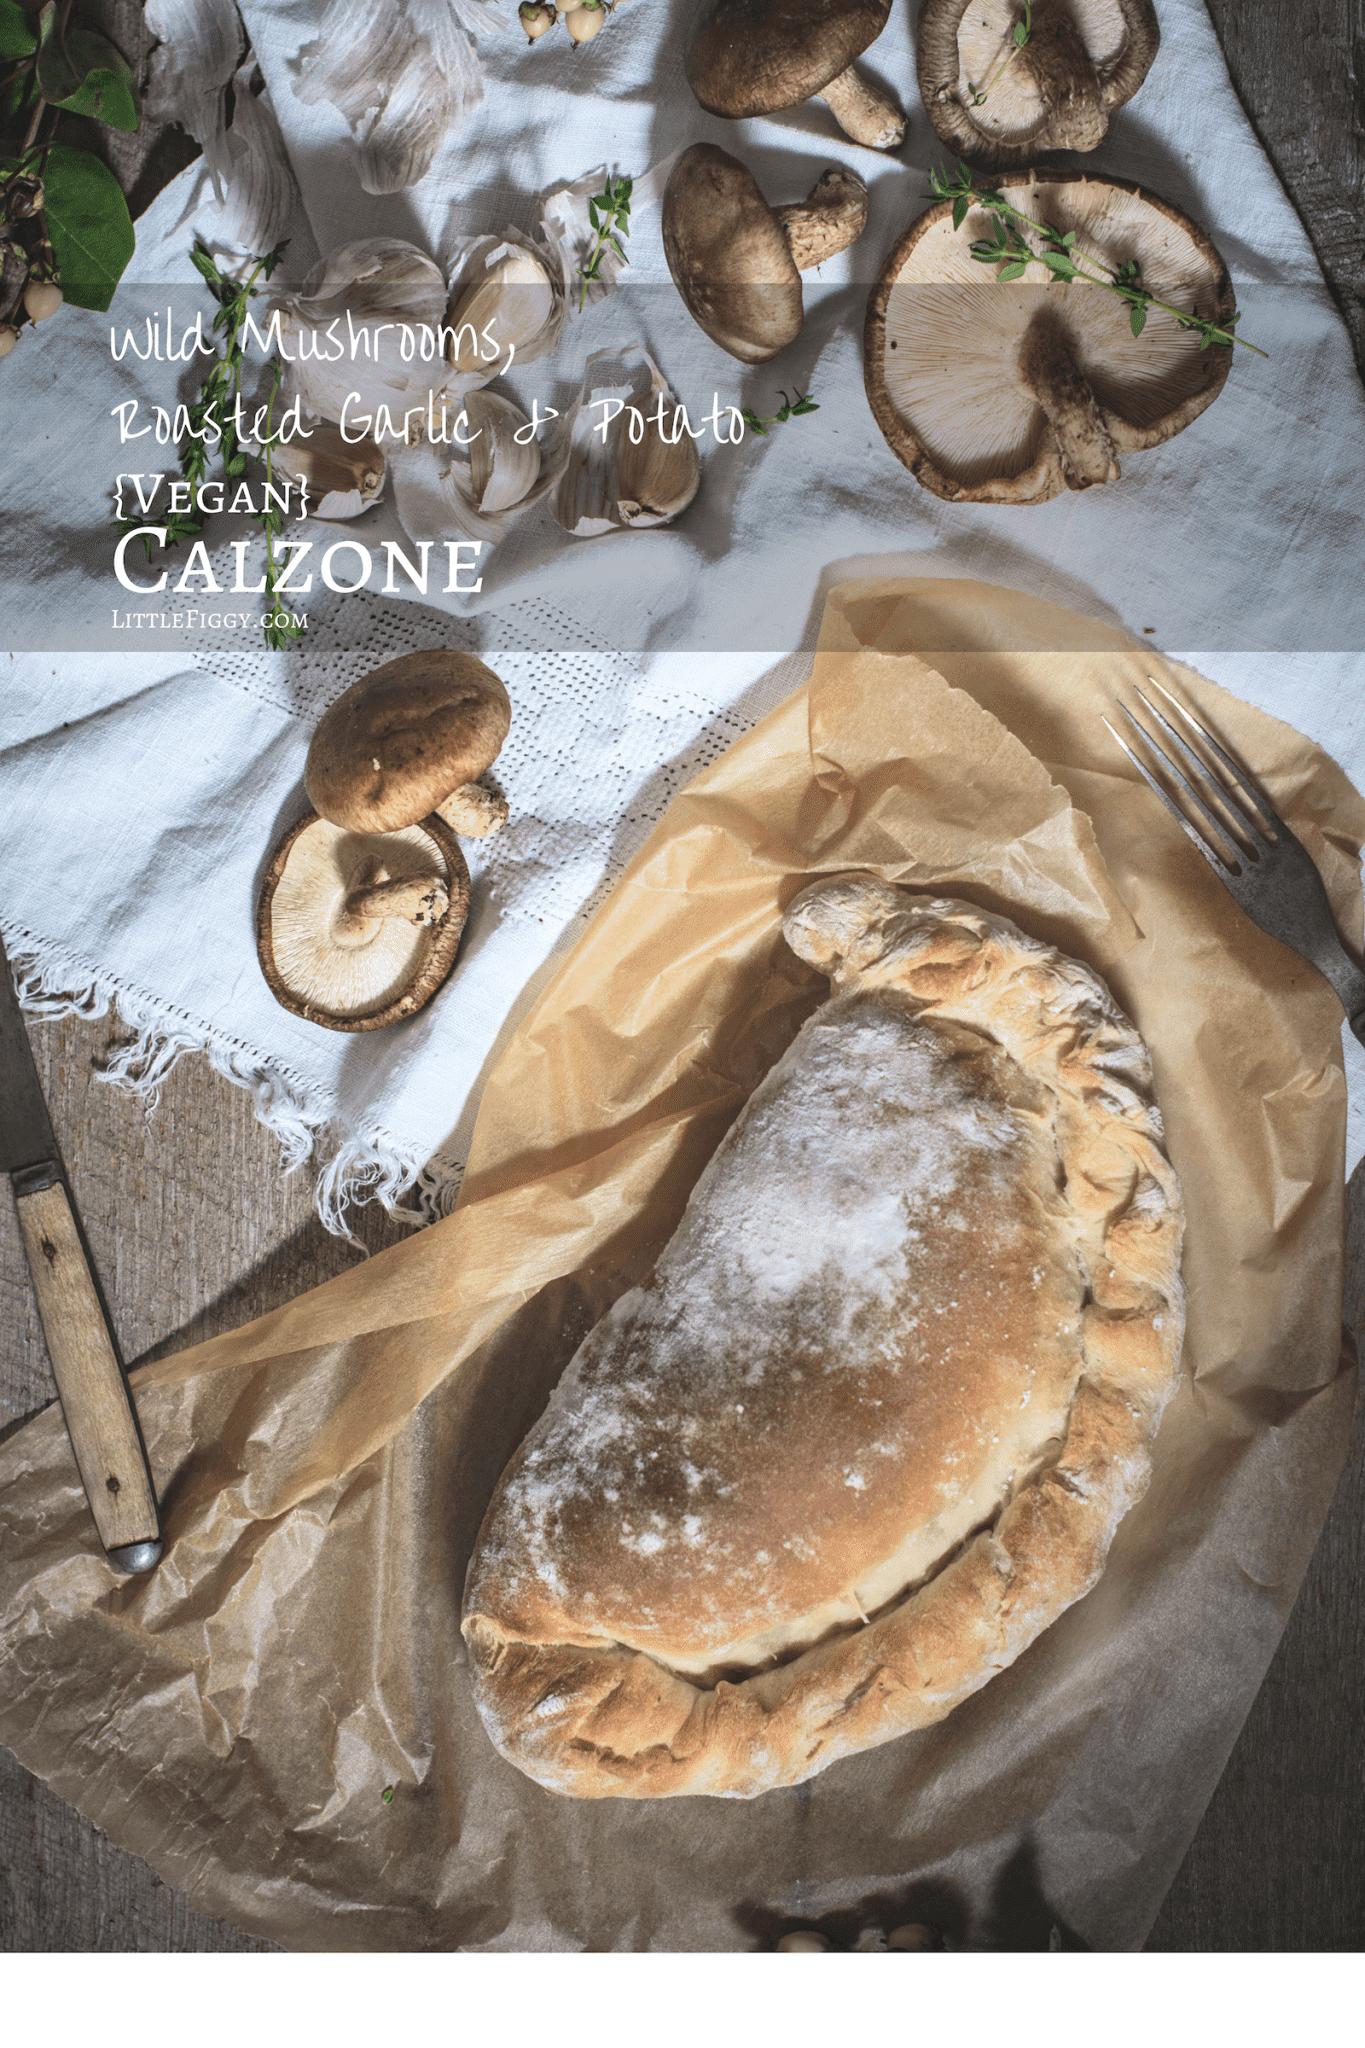 The perfect comfort food, vegan Garlic & Potato Calzone recipe! #ad @IdahoPotato #IdahoPotatoes #pizza #vegan #recipeoftheday #dinner